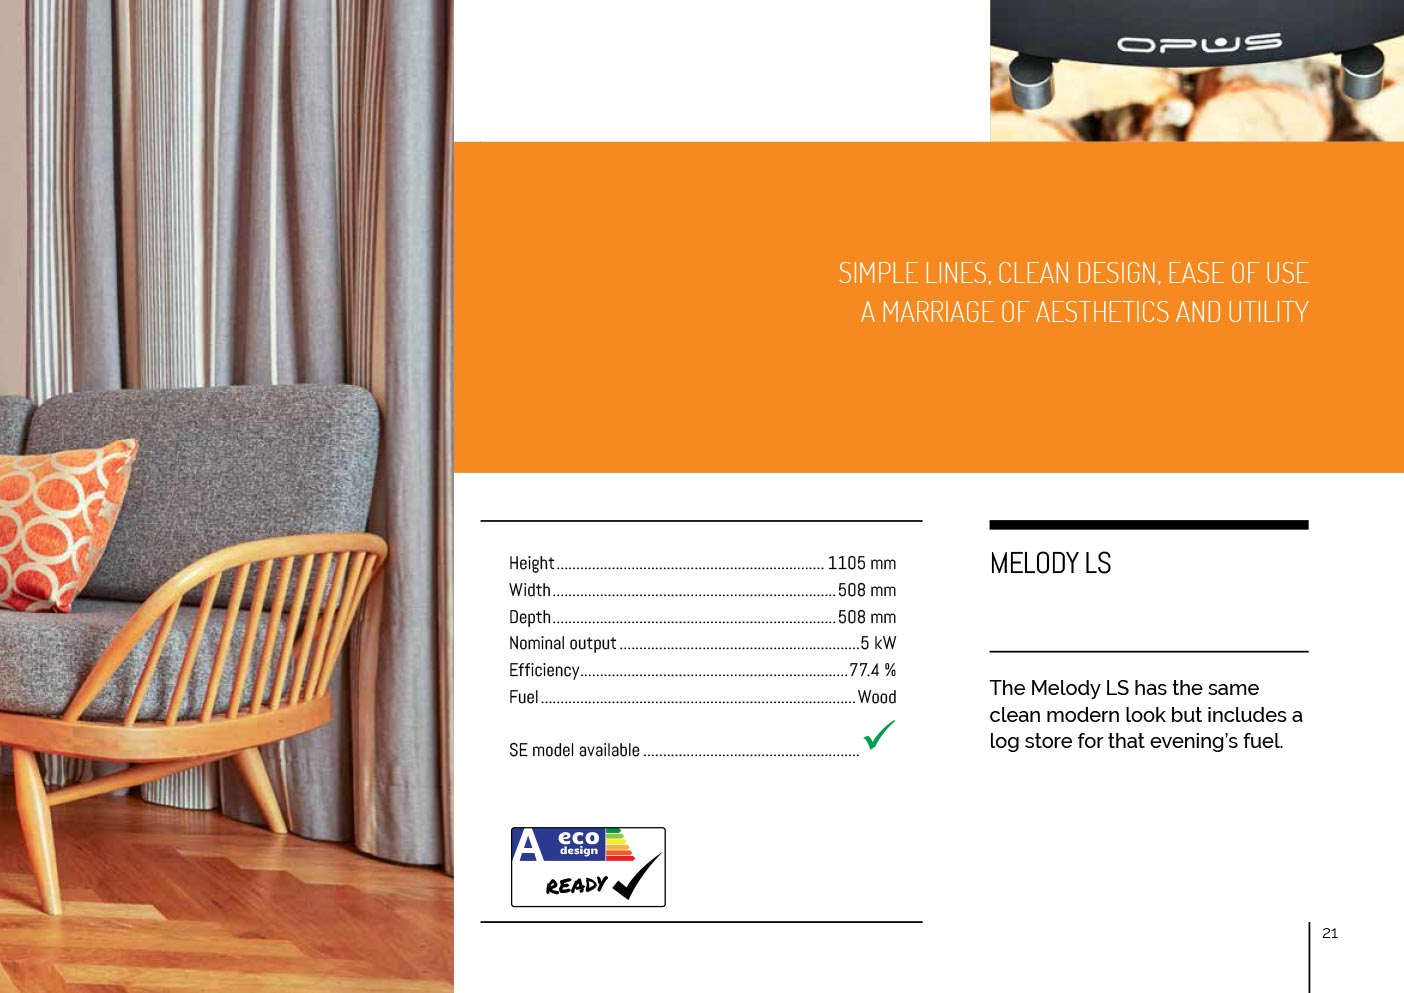 opus-stoves-brochure-(2)-21